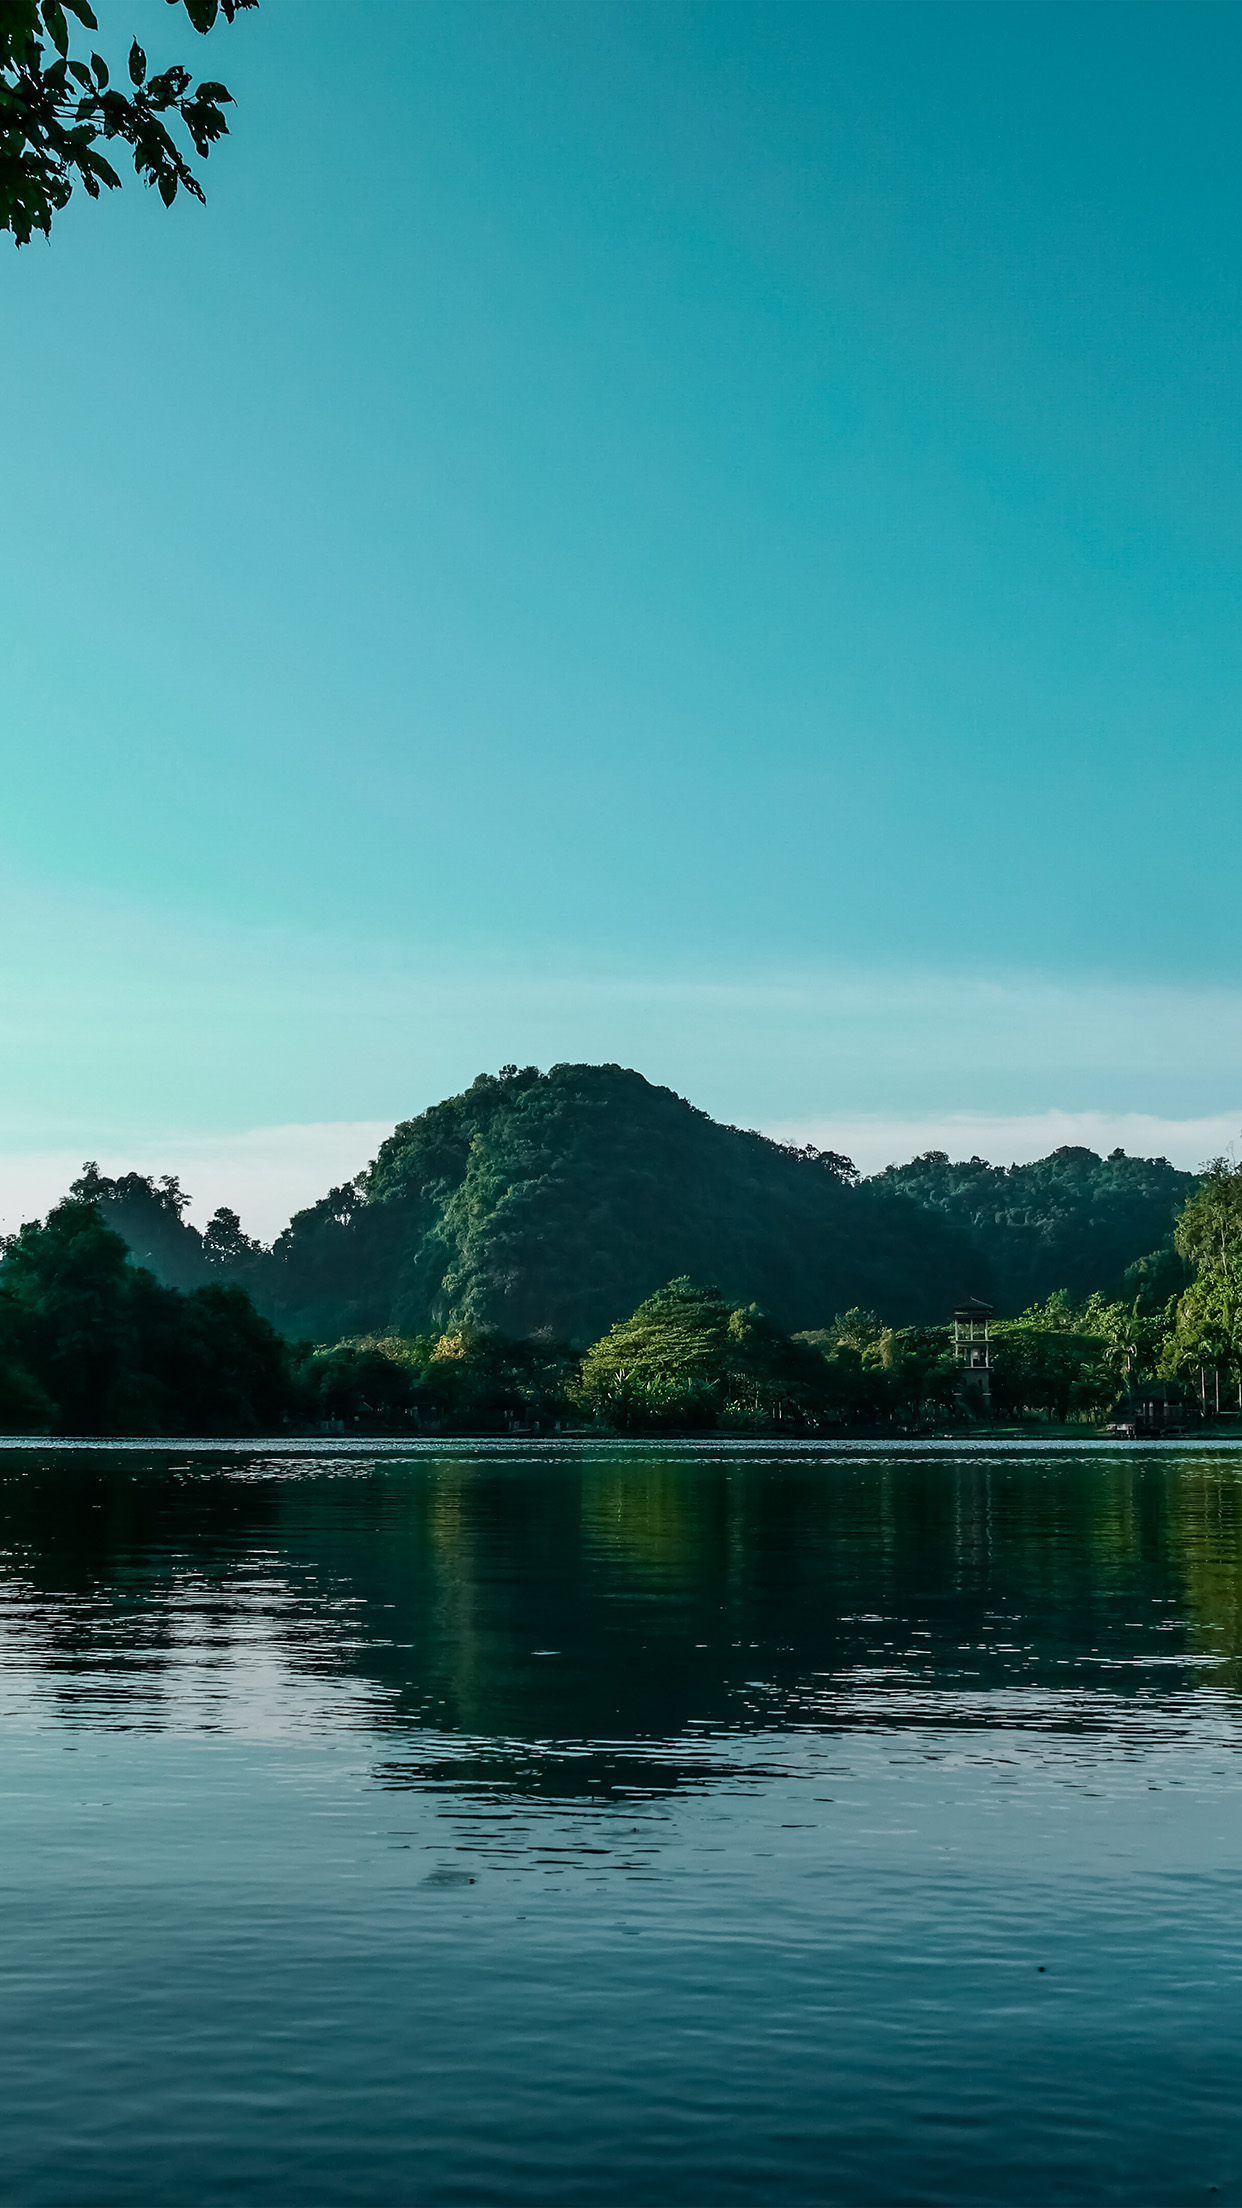 Nature River Lake Mountain Tree Vacation Blue Green